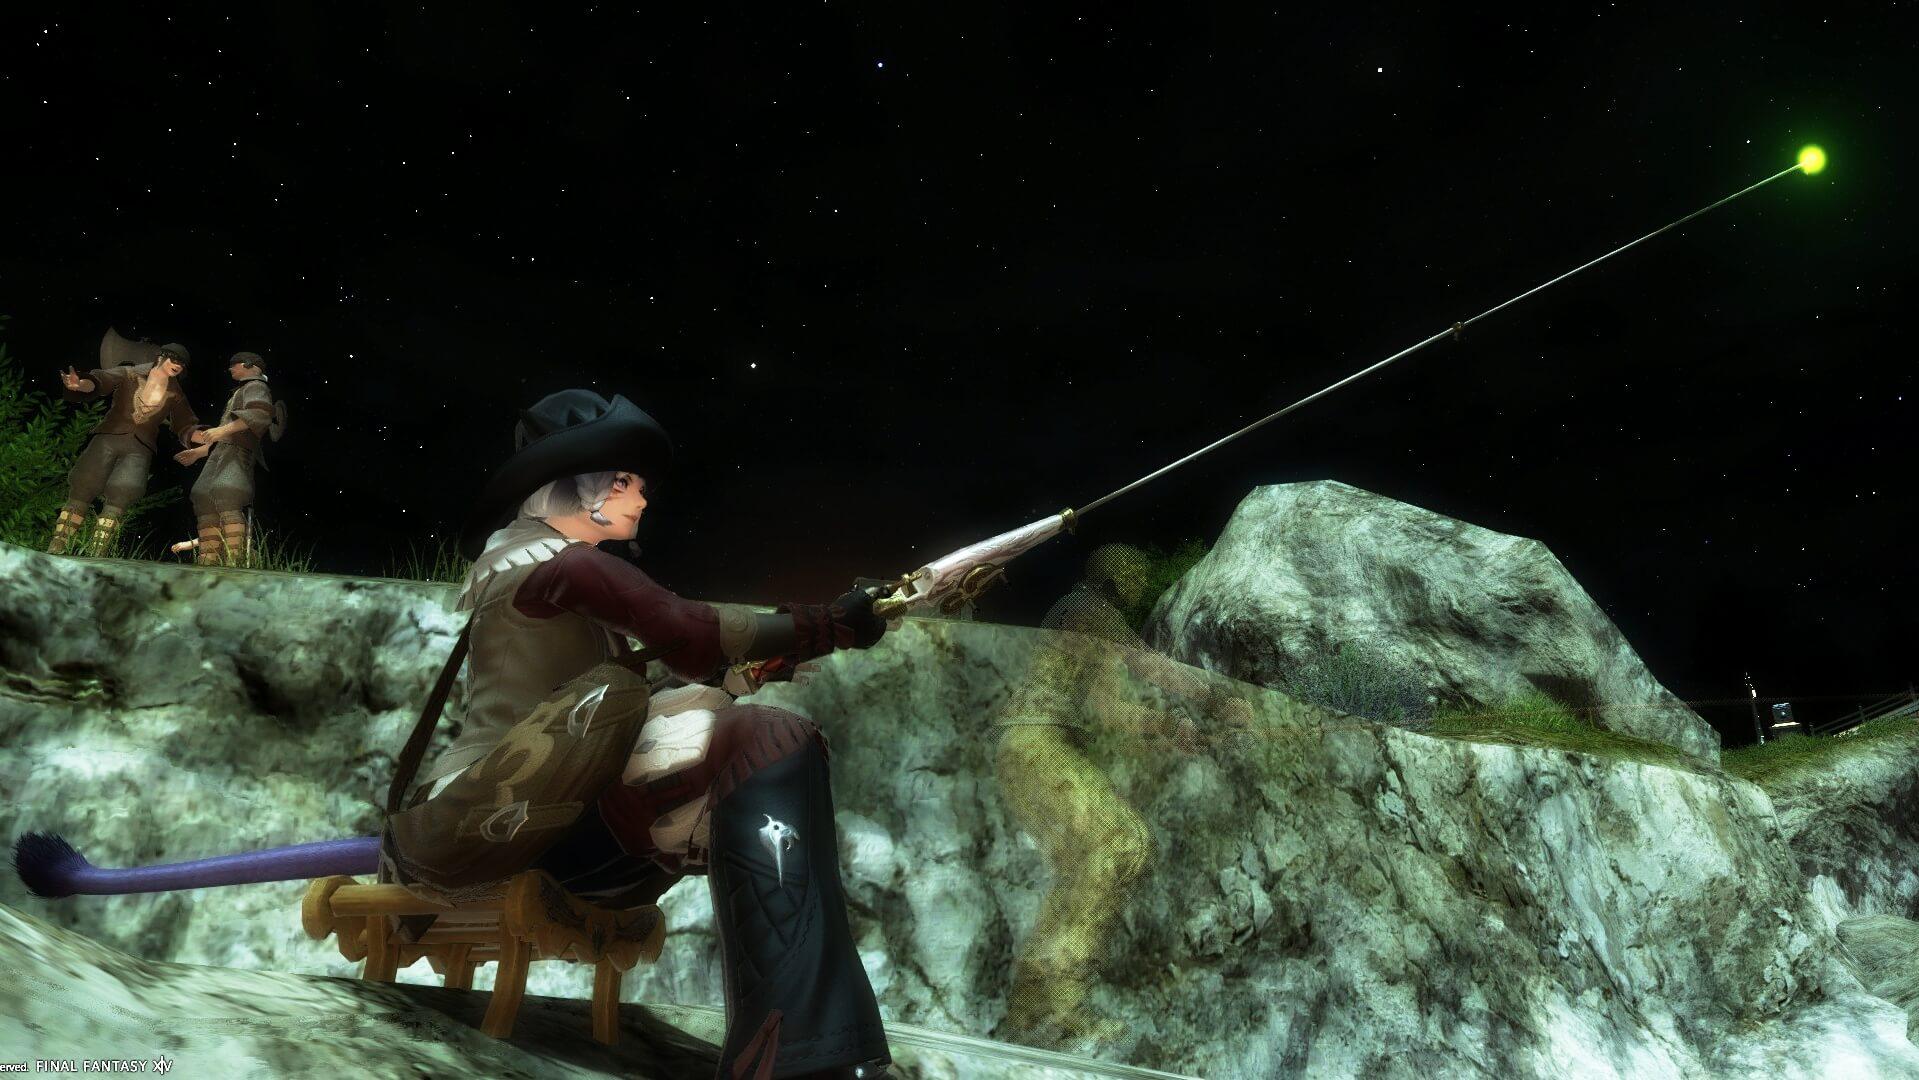 【FF14】いざ釣りへ!!忘れてはいけない釣り師必須のスキルとは?!(超初級編)